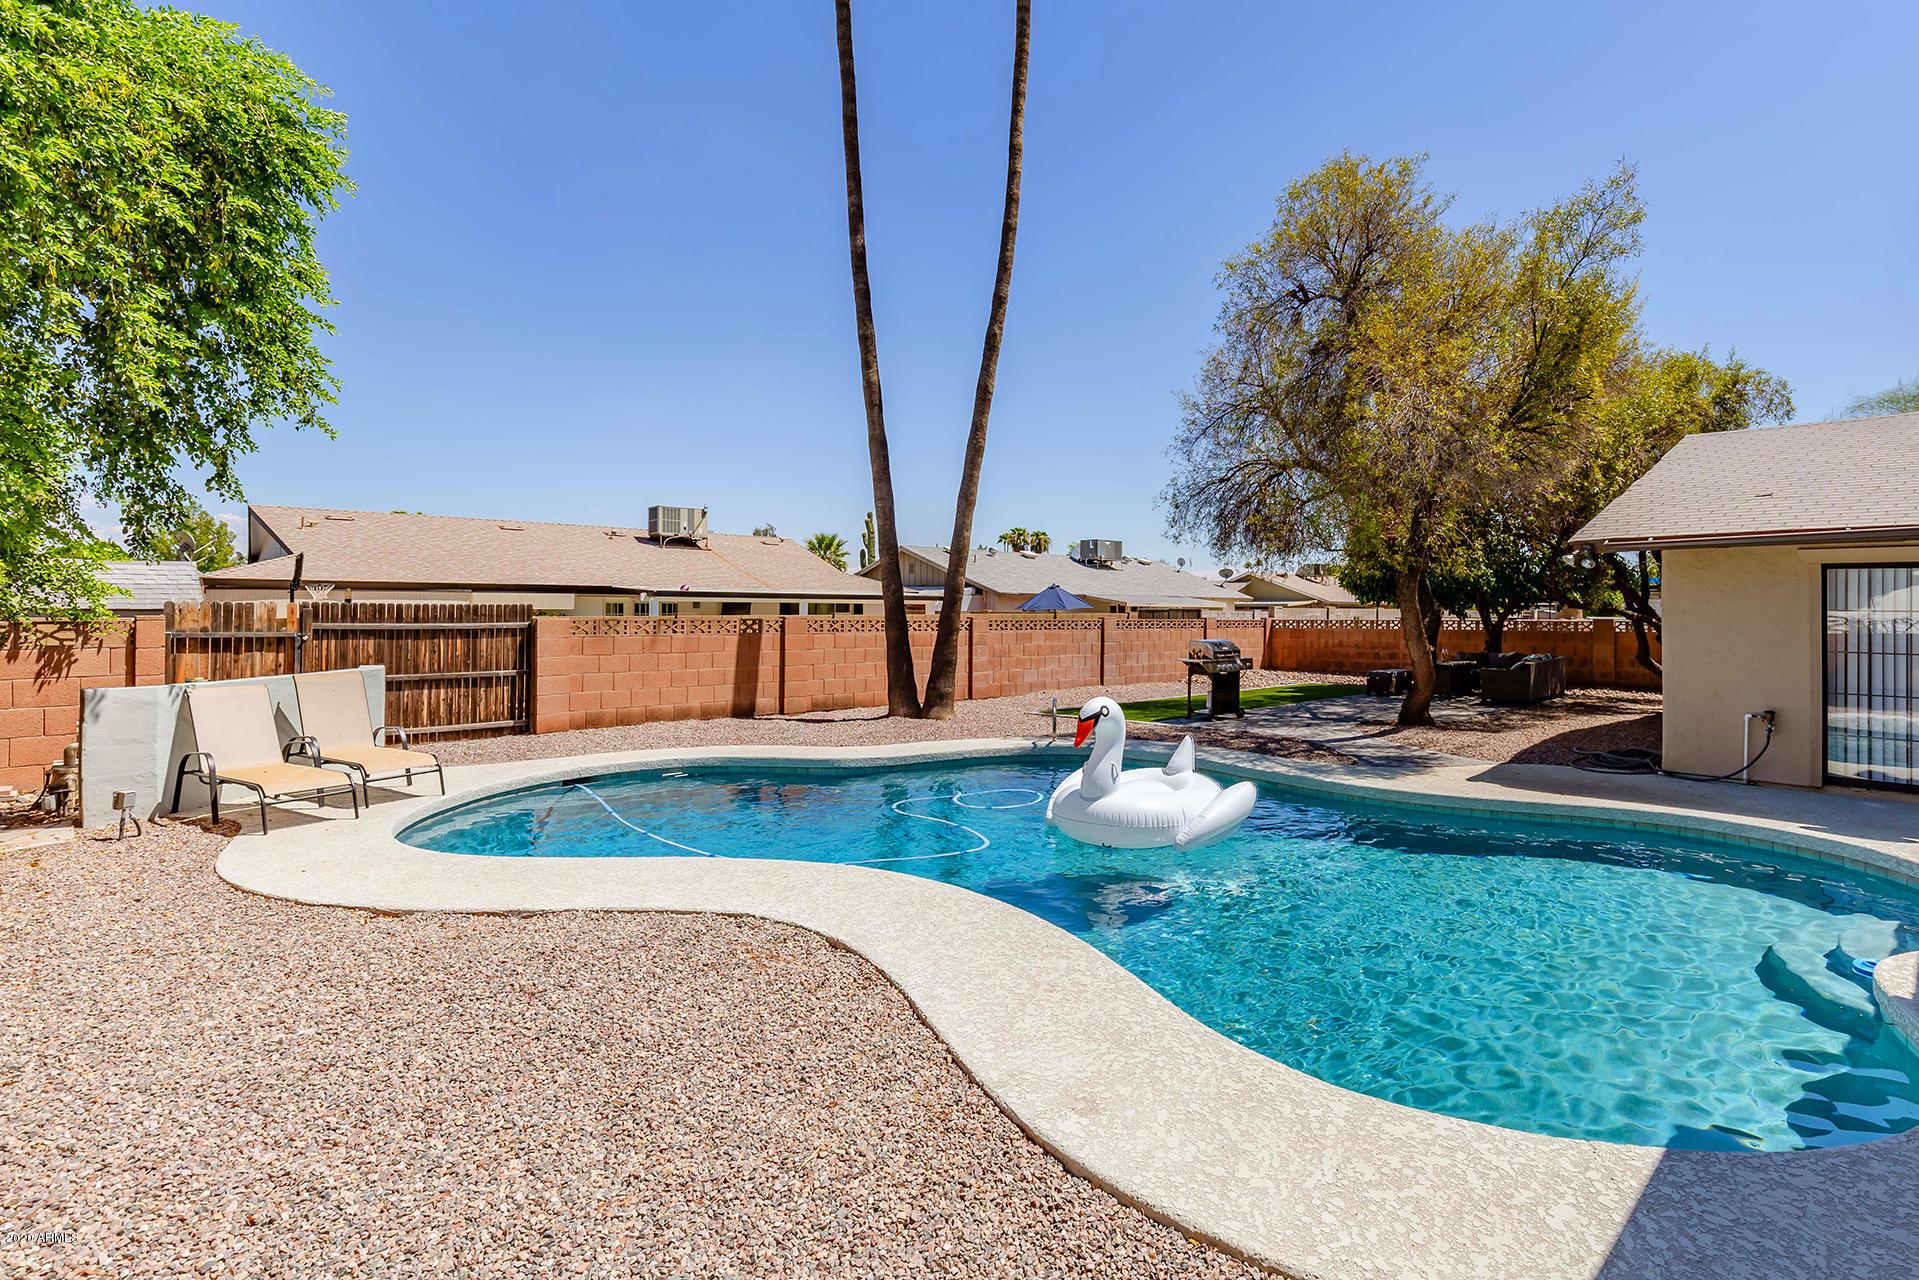 3931 N 86th Street, Scottsdale, AZ 85251, 3 Bedrooms Bedrooms, ,Residential Lease,For Rent,3931 N 86th Street,5973233